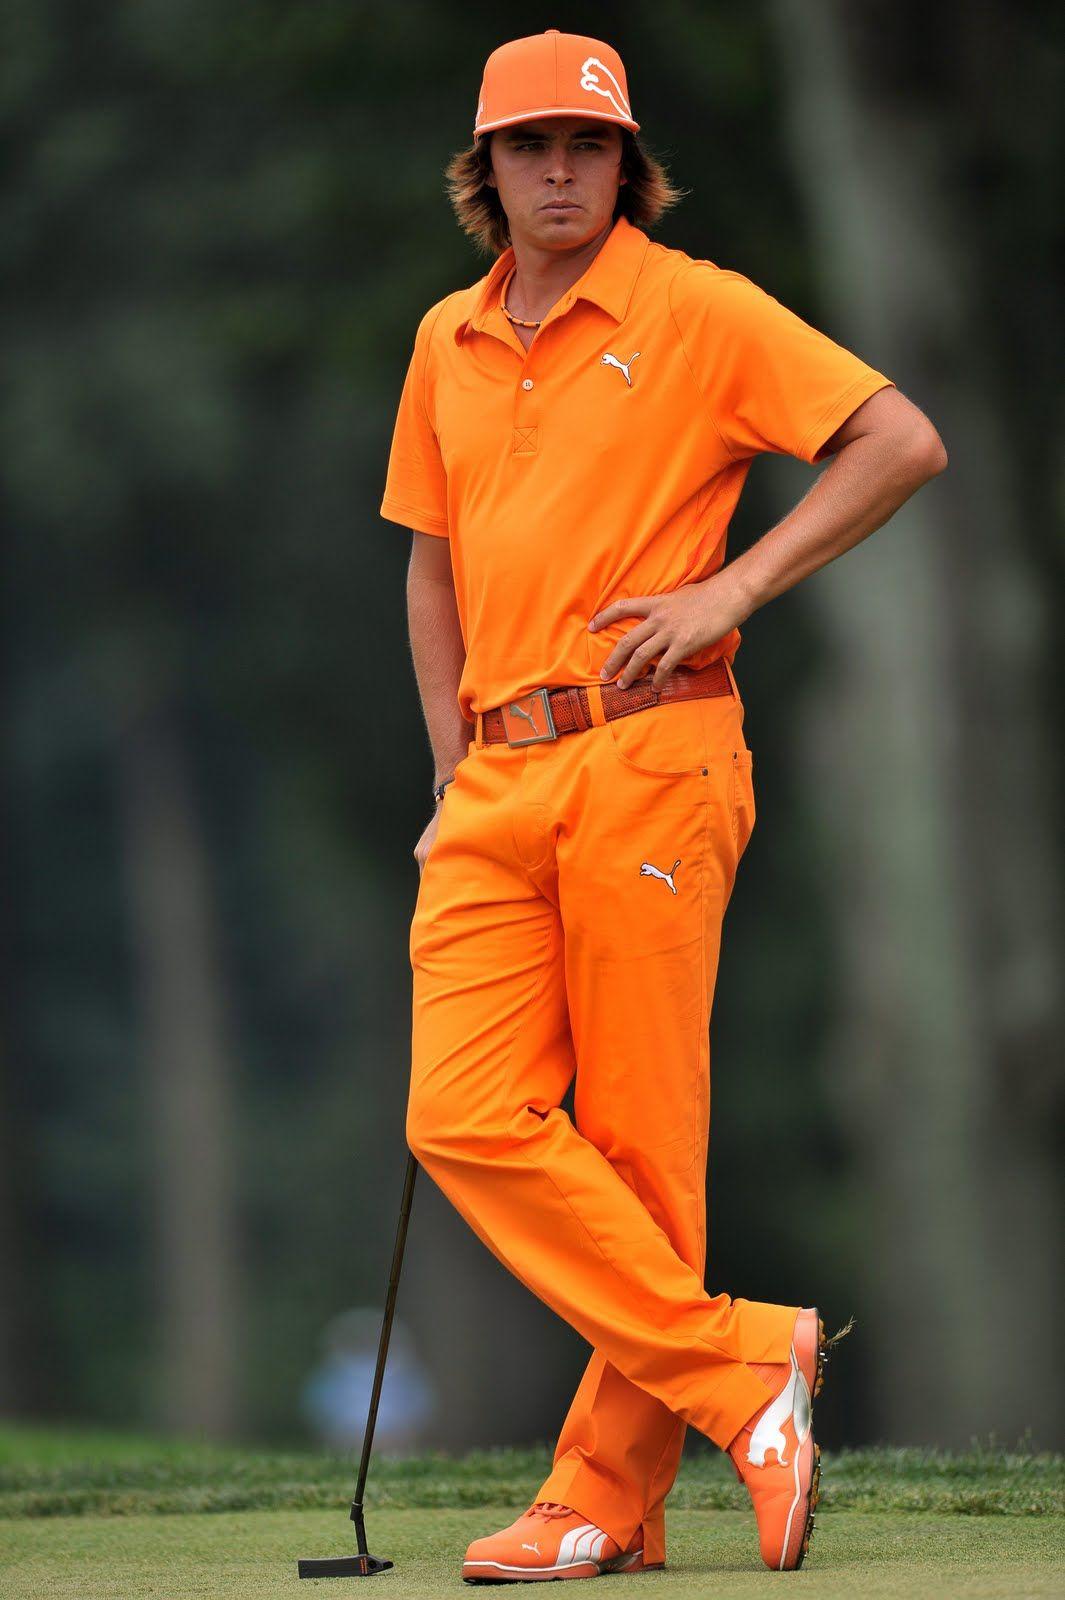 puma golf athletes